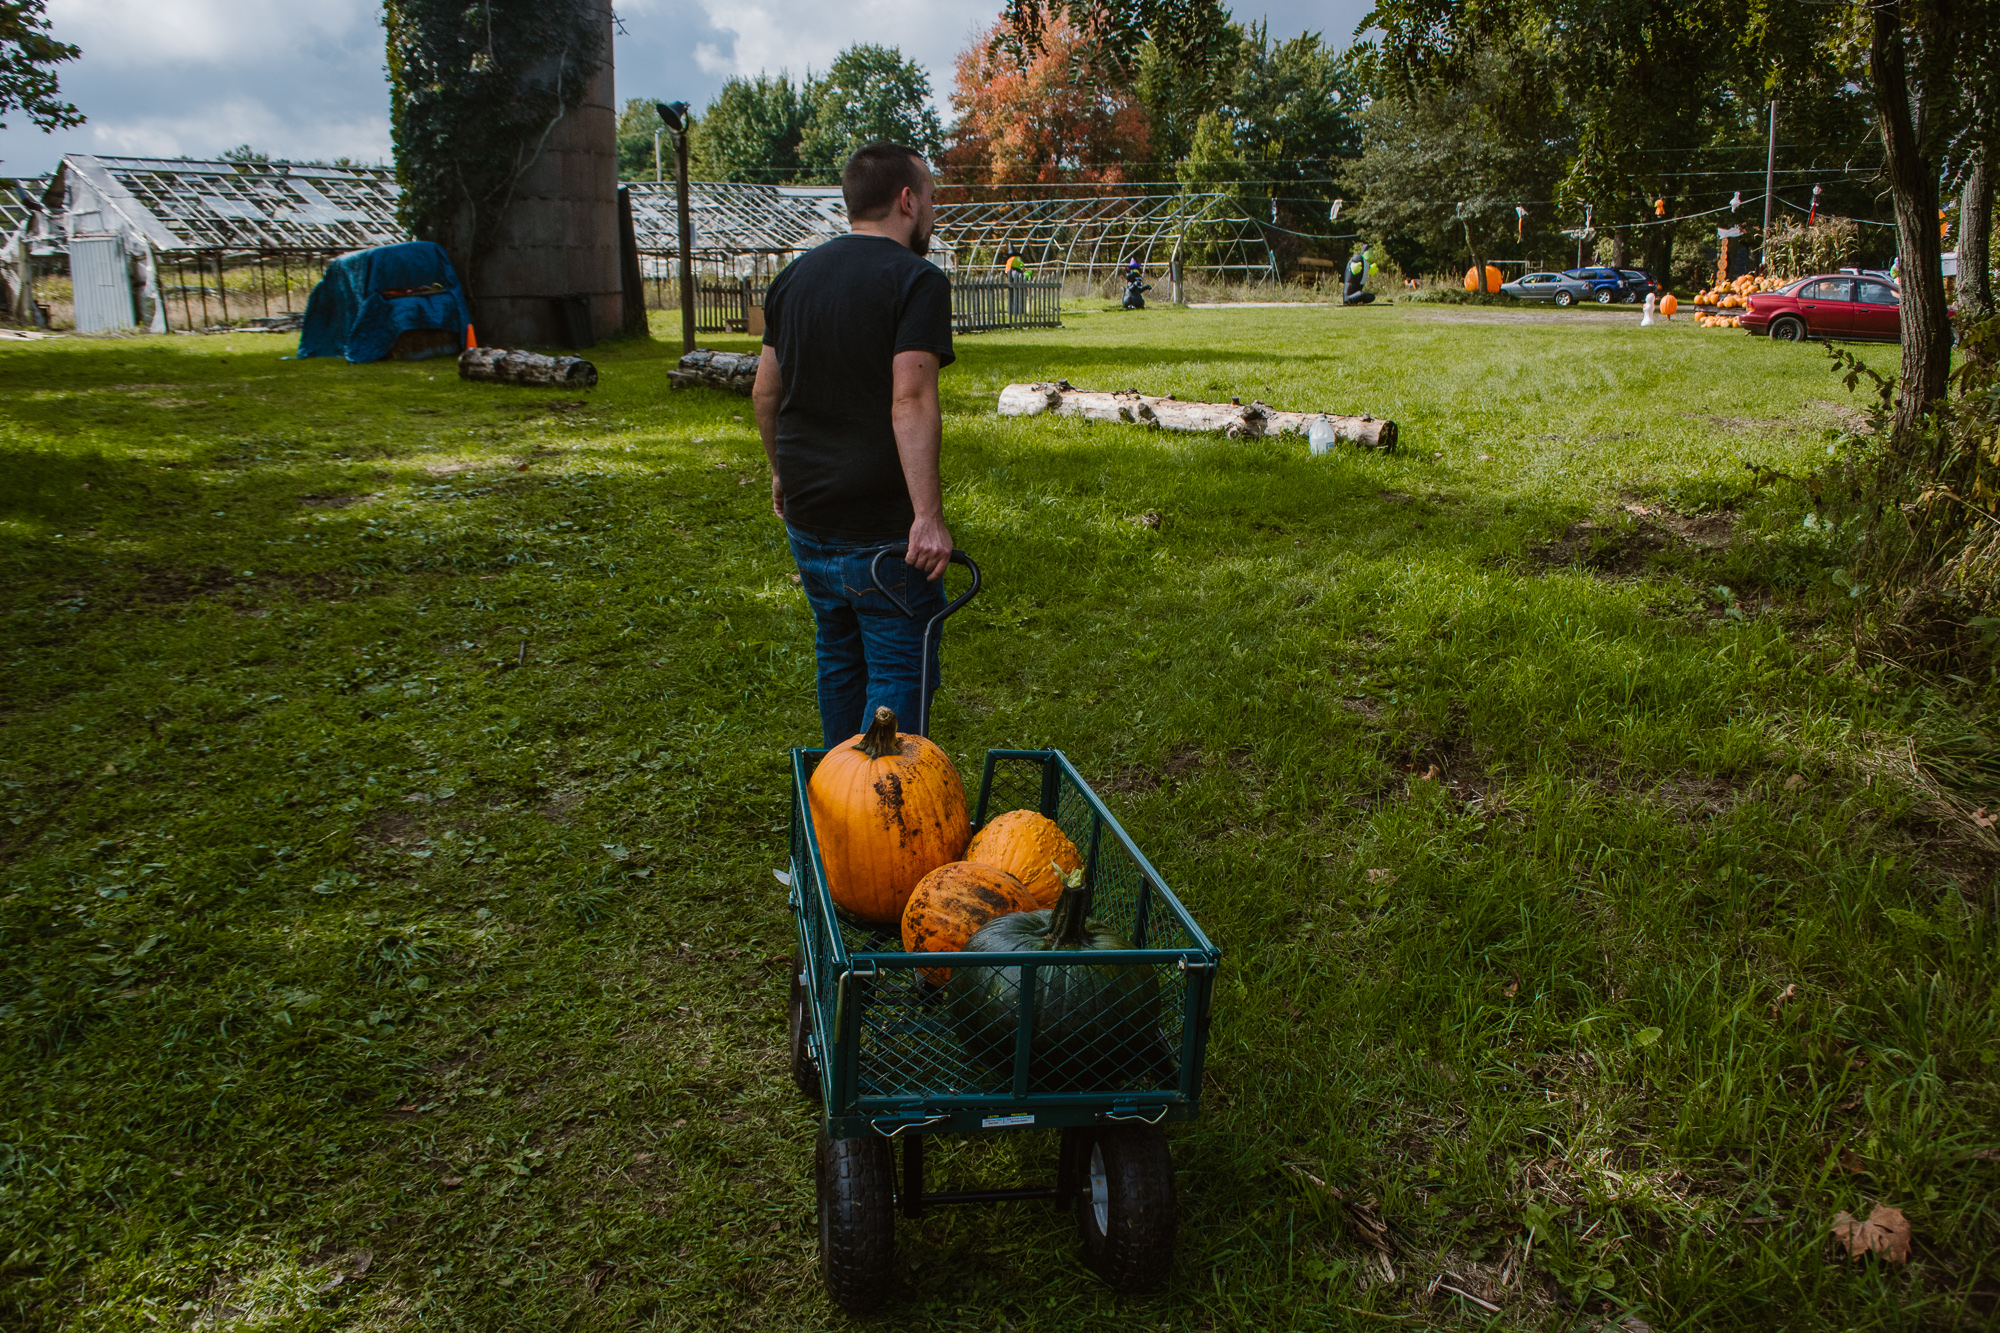 bethke-farms-pumpkin-patch-grand-haven-michigan (3).jpg